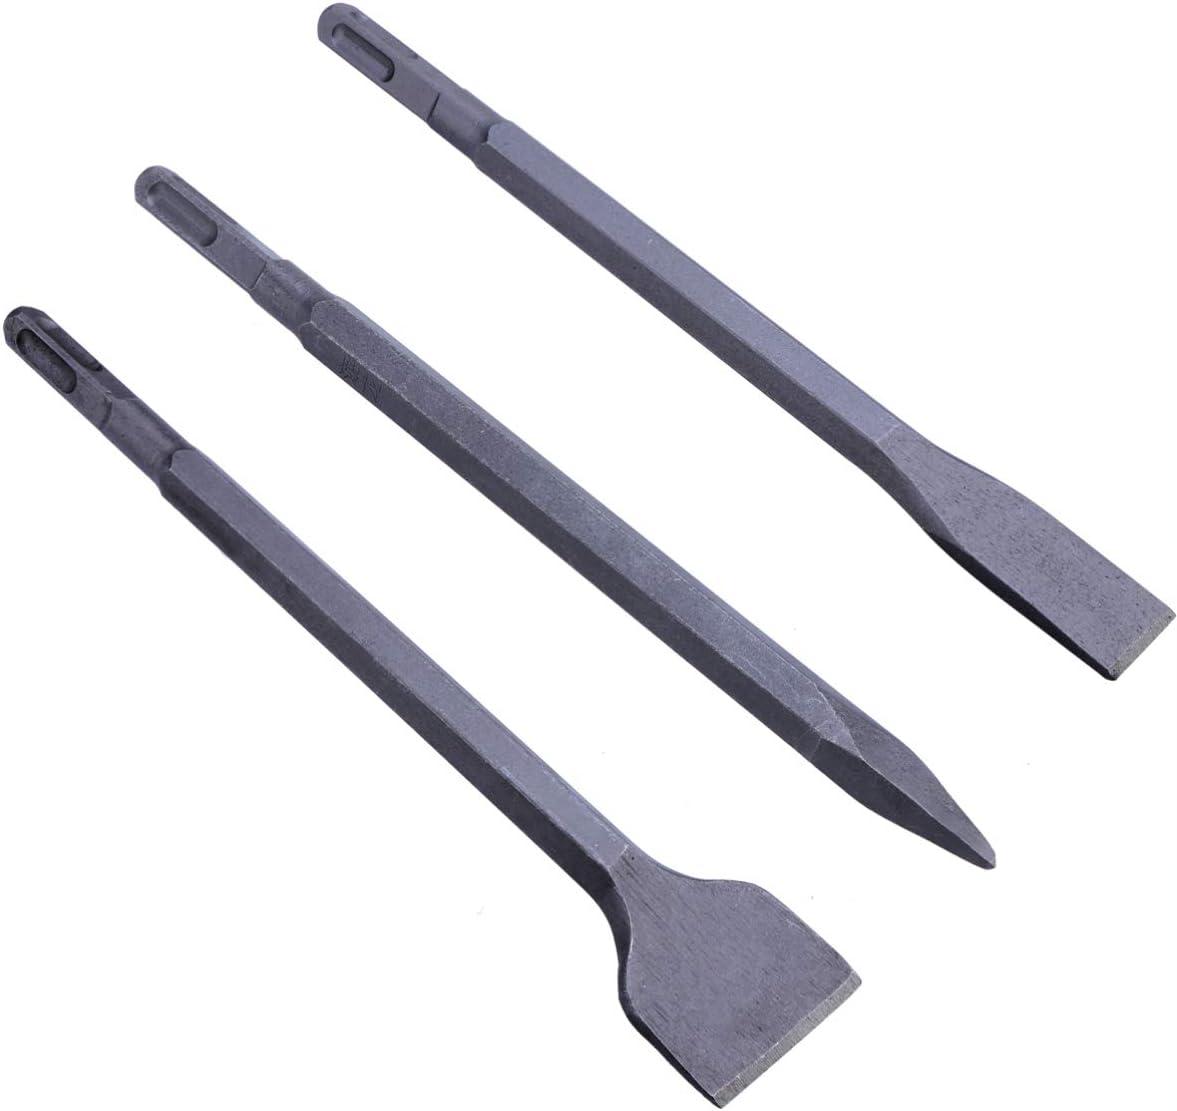 ULTECHNOVO Purchase 3pcs SDS-Plus Rotary Hammer Chisel Electric Hamme Bit shipfree